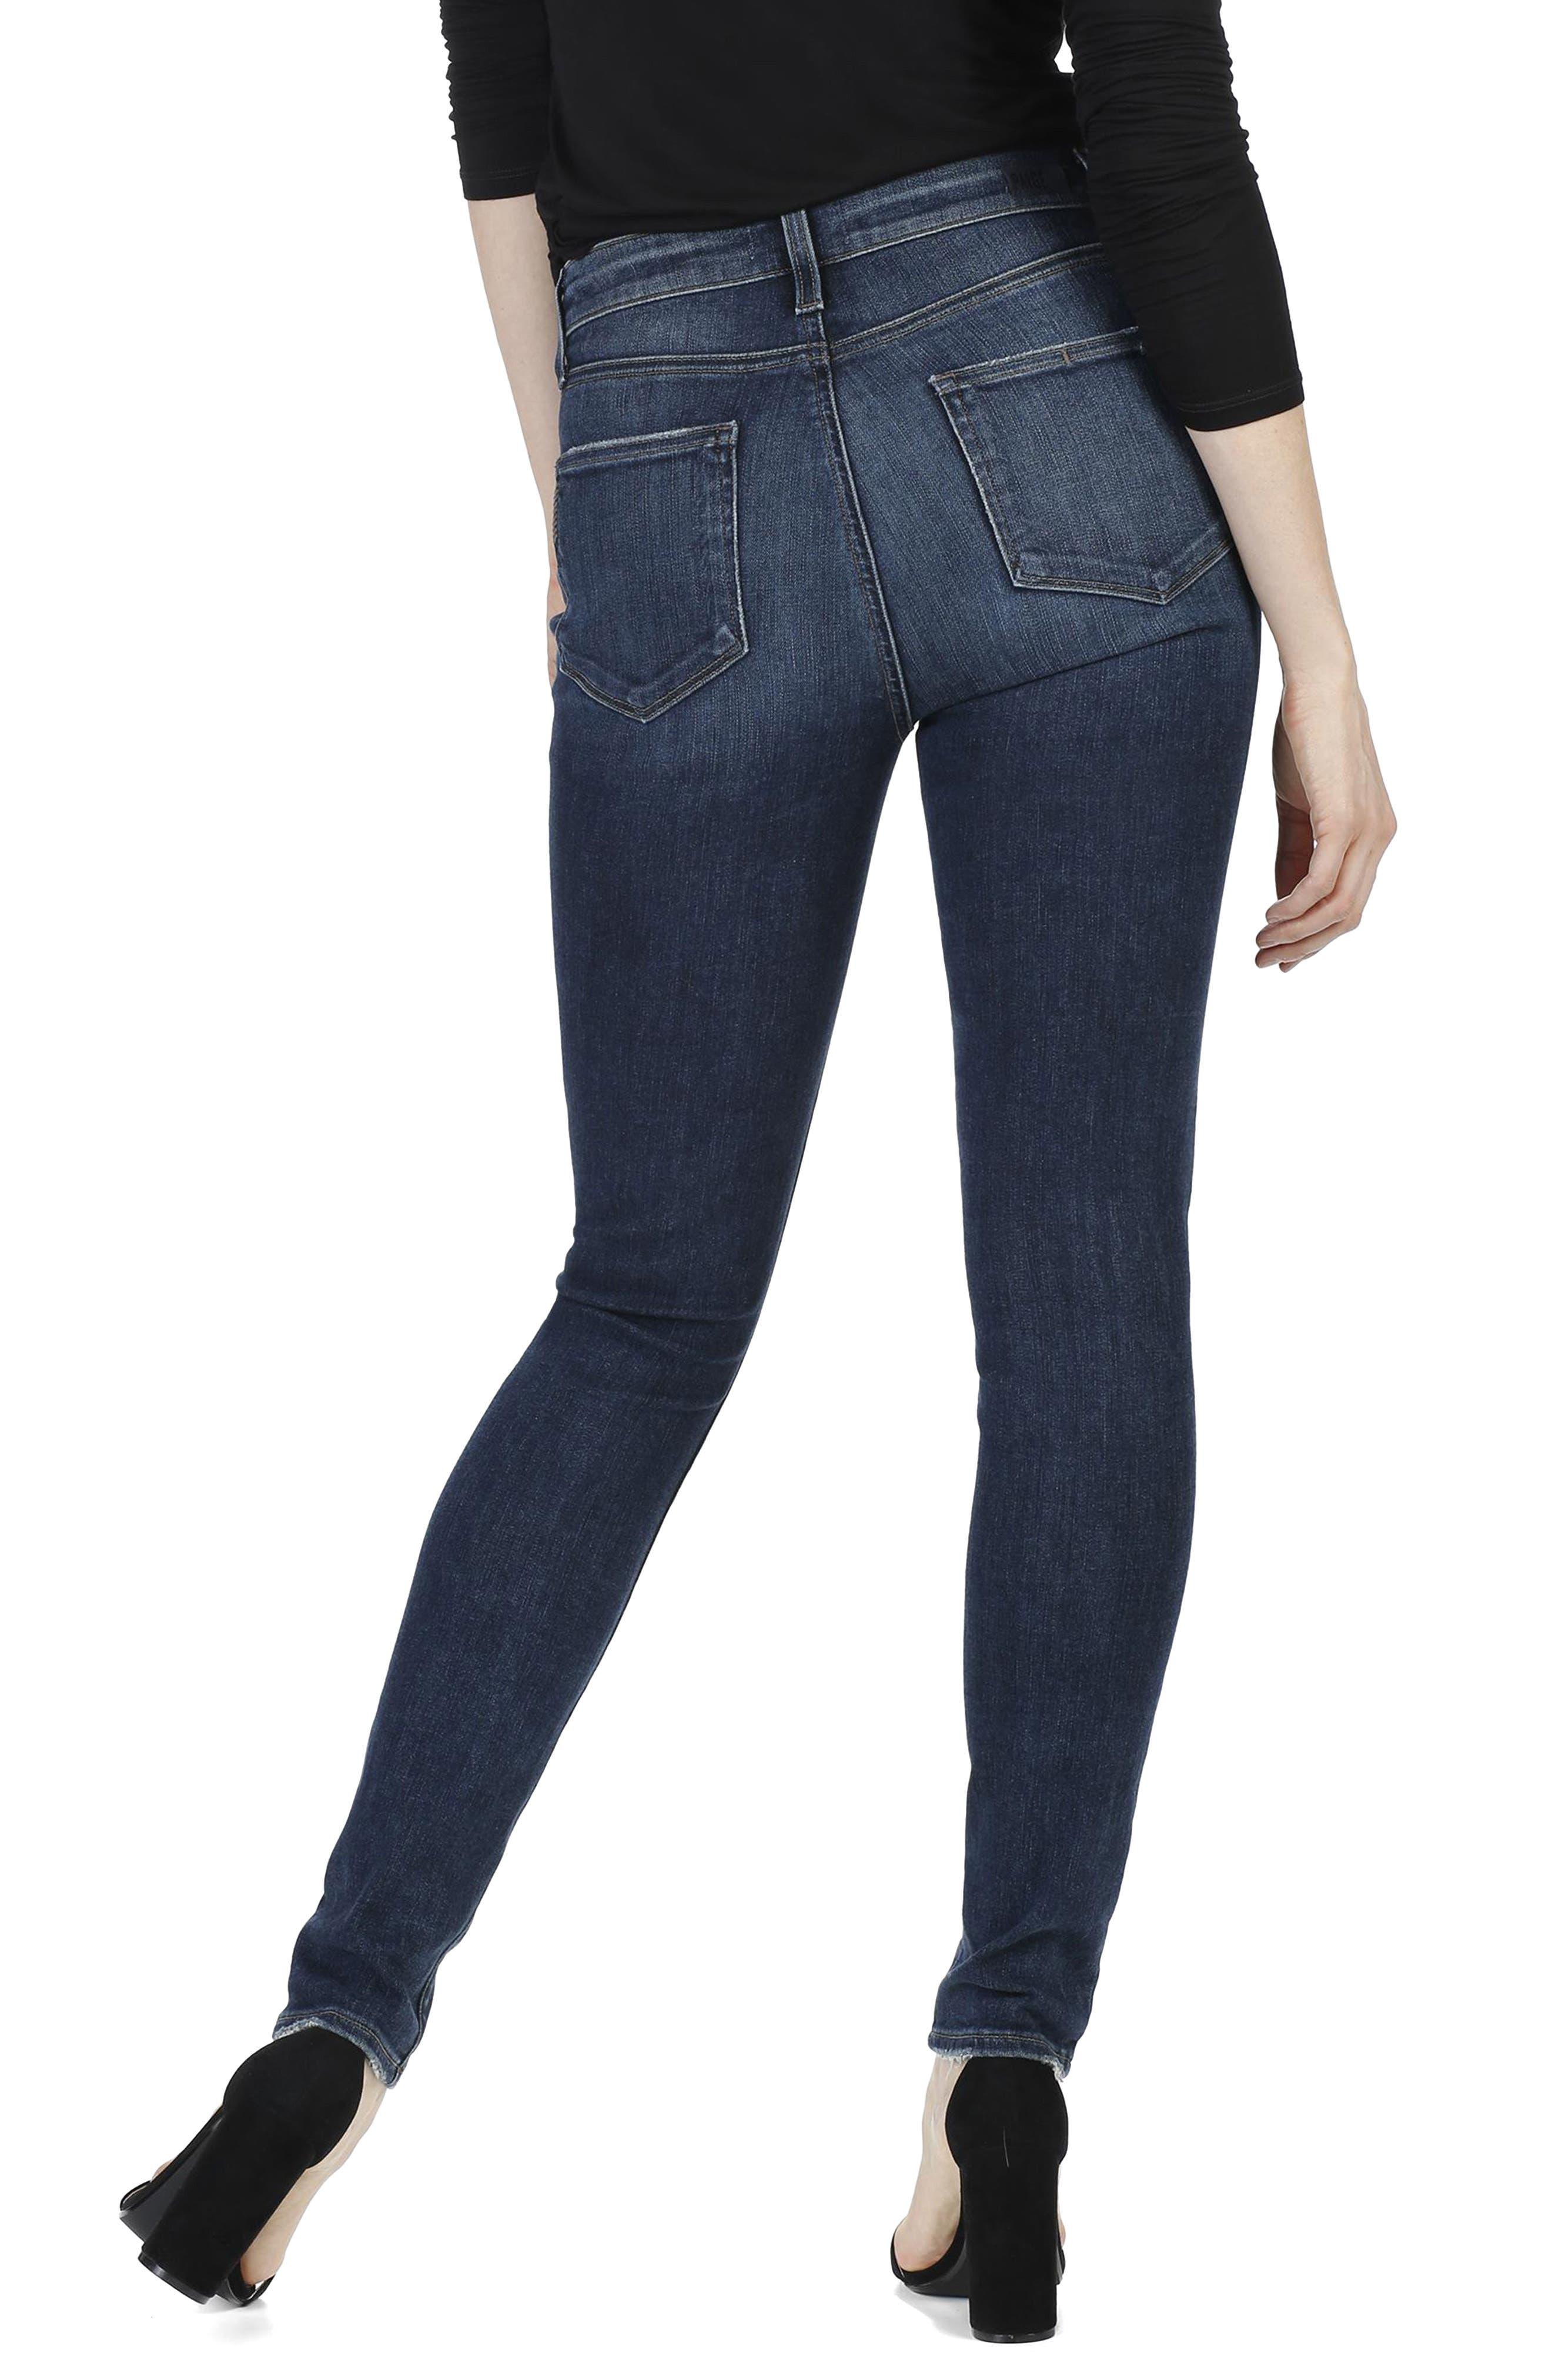 Transcend - Hoxton High Waist Ultra Skinny Jeans,                             Alternate thumbnail 3, color,                             400